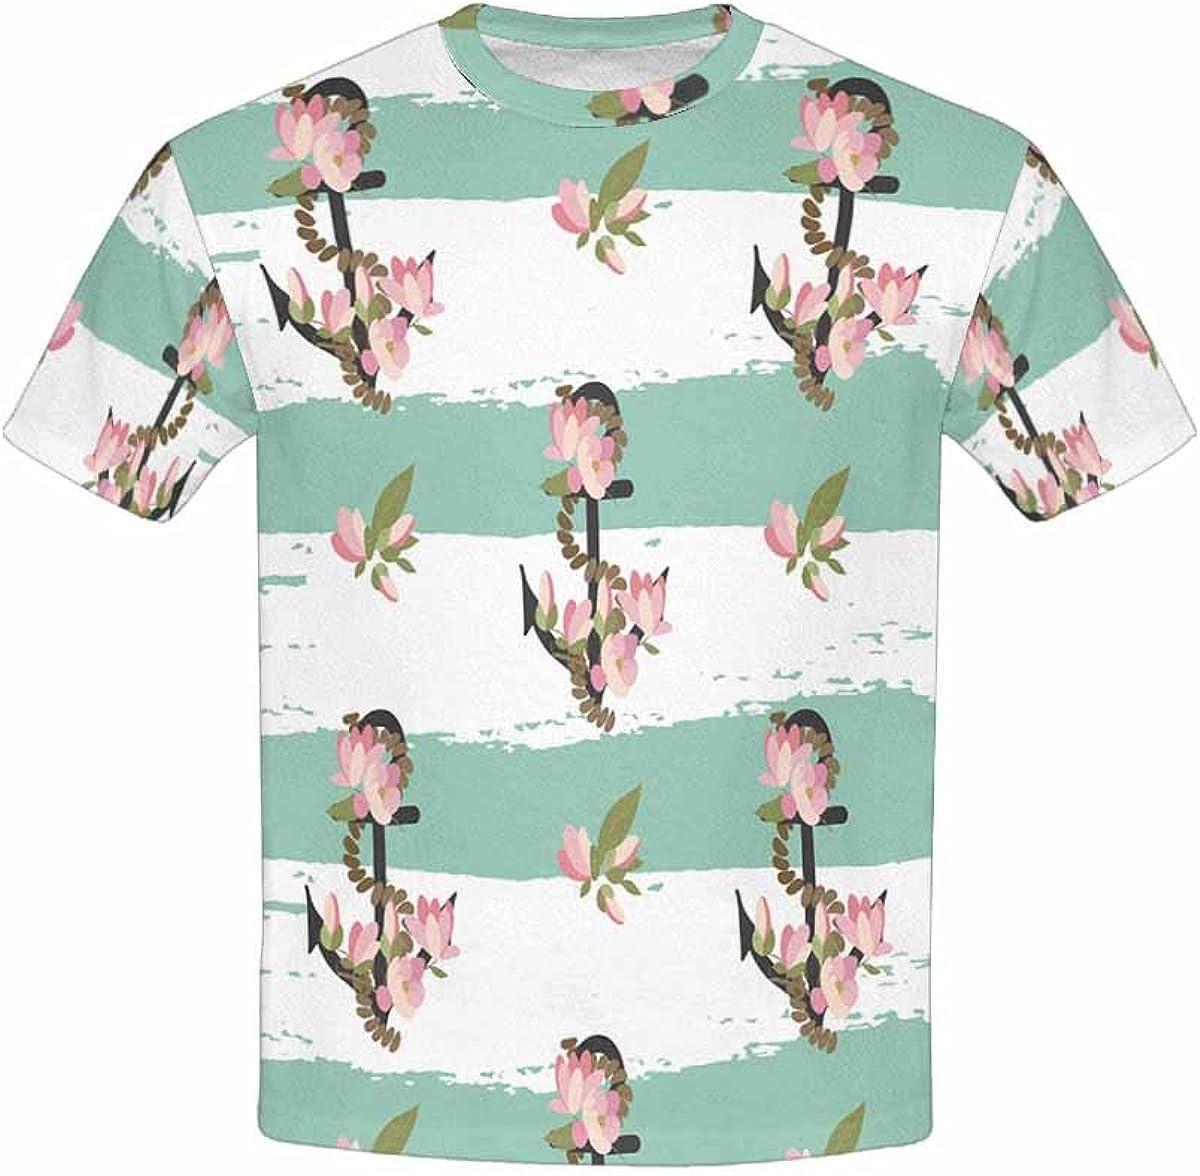 INTERESTPRINT Kids T-Shirt Floral Magnolia Vintage XS-XL